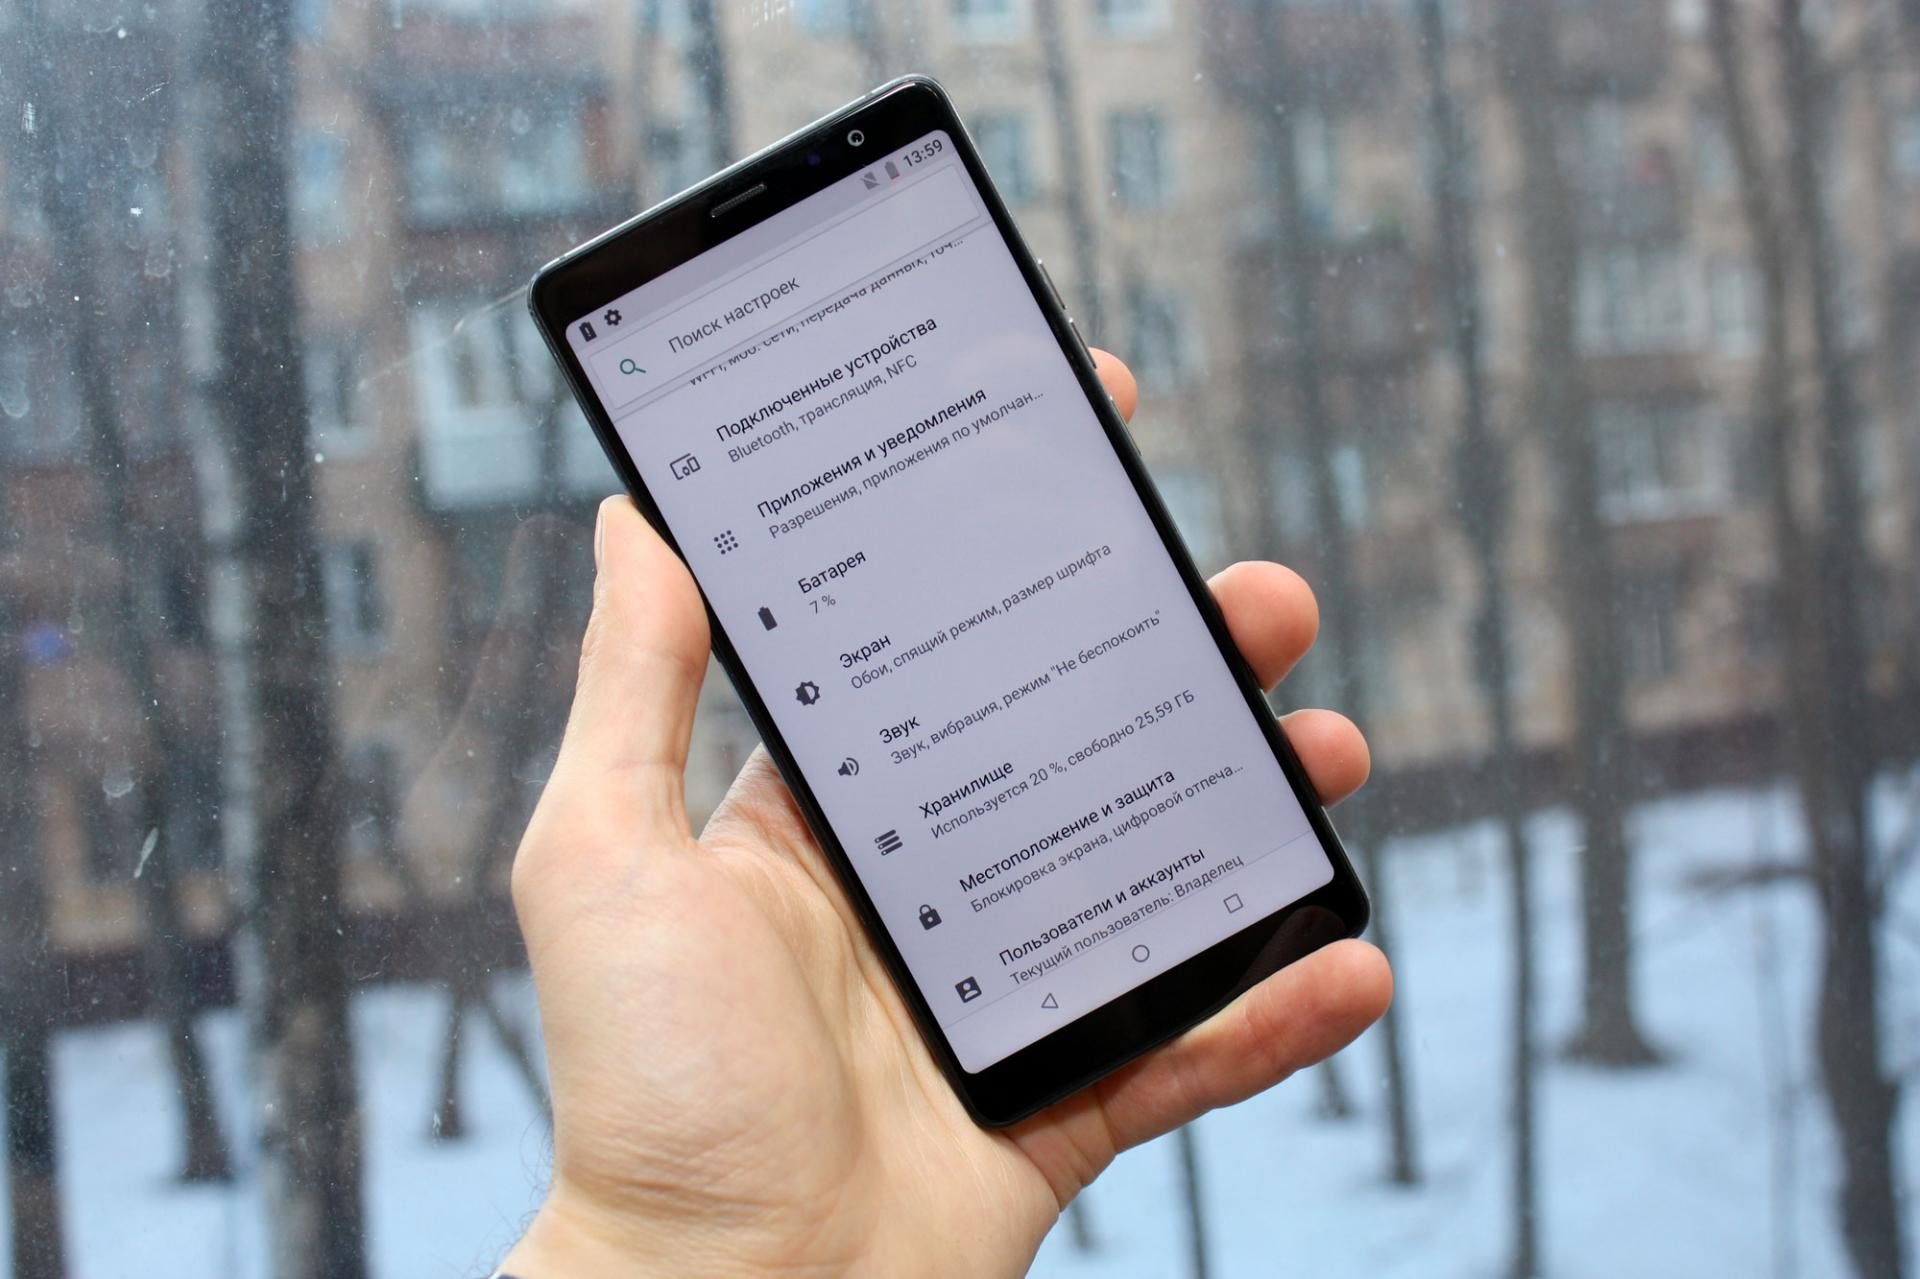 Обзор смартфона Highscreen Power Five Max 2